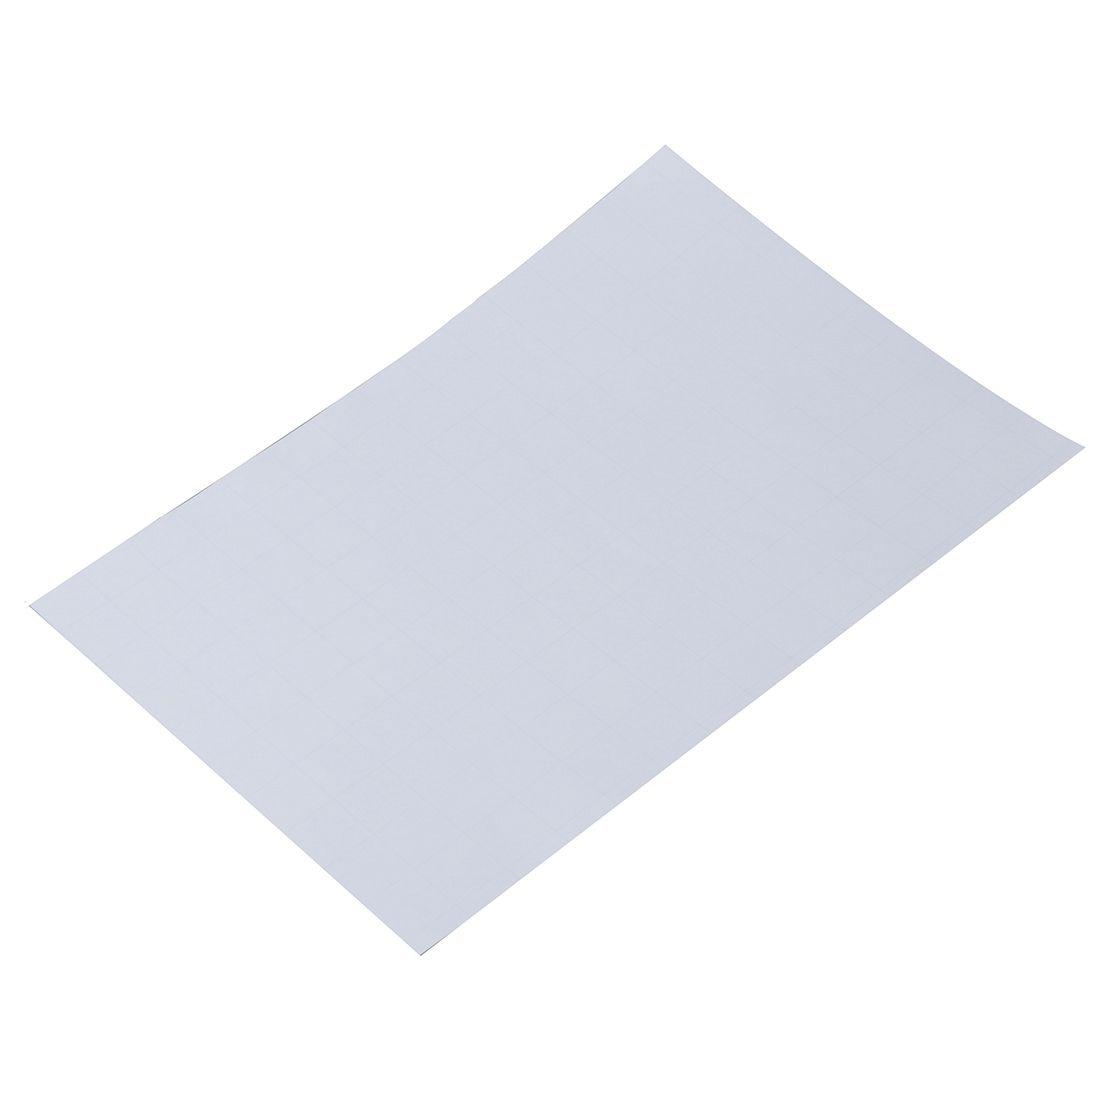 2 PCS of 10 Sheets A4 Inkjet Transfer Paper Transfer Paper for T-Shirt